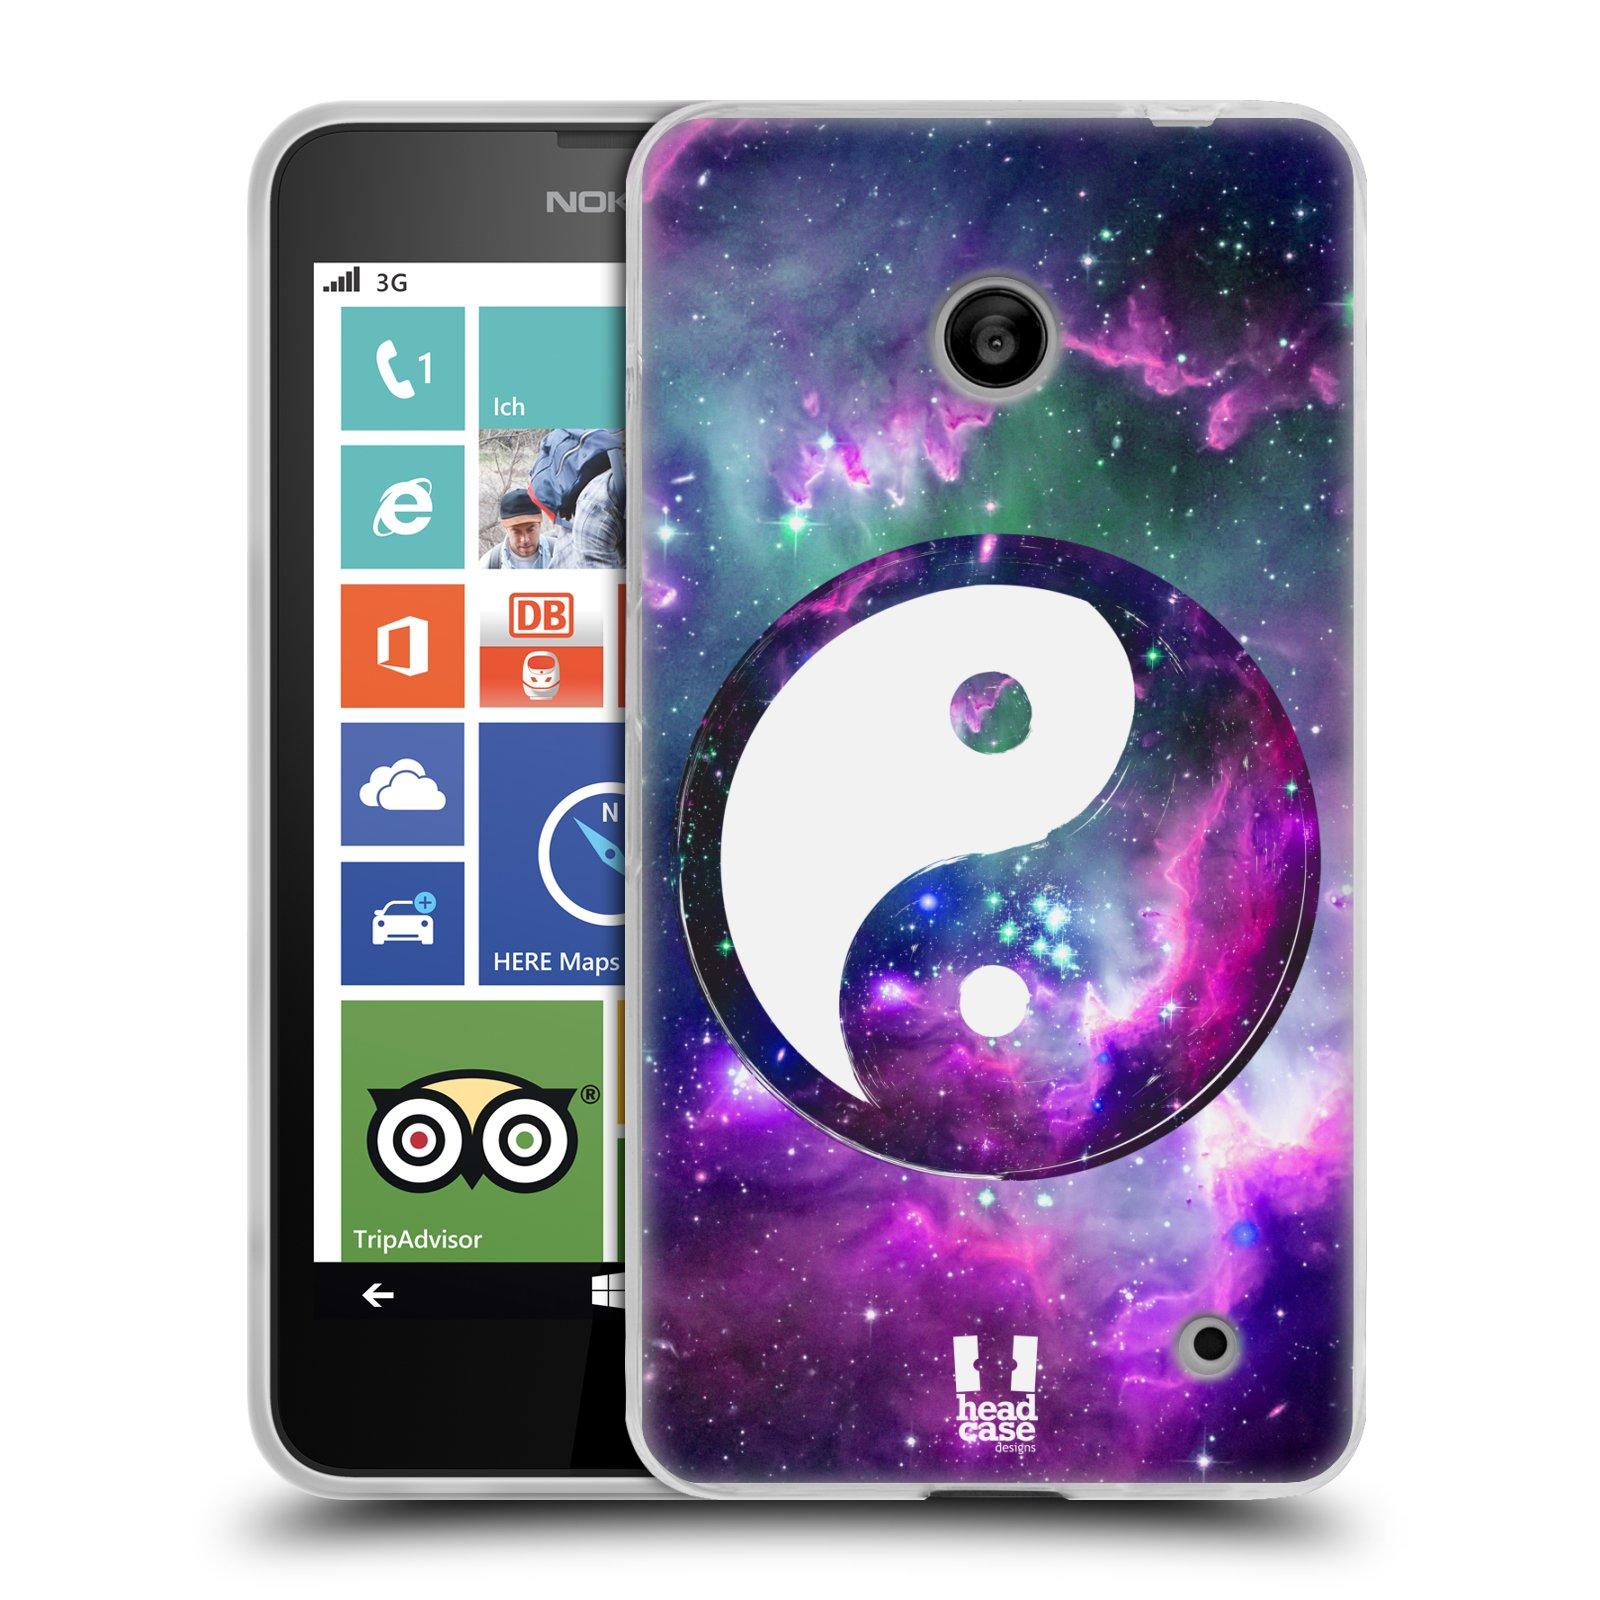 Silikonové pouzdro na mobil Nokia Lumia 635 HEAD CASE YIn a Yang PURPLE (Silikonový kryt či obal na mobilní telefon Nokia Lumia 635 Dual SIM)